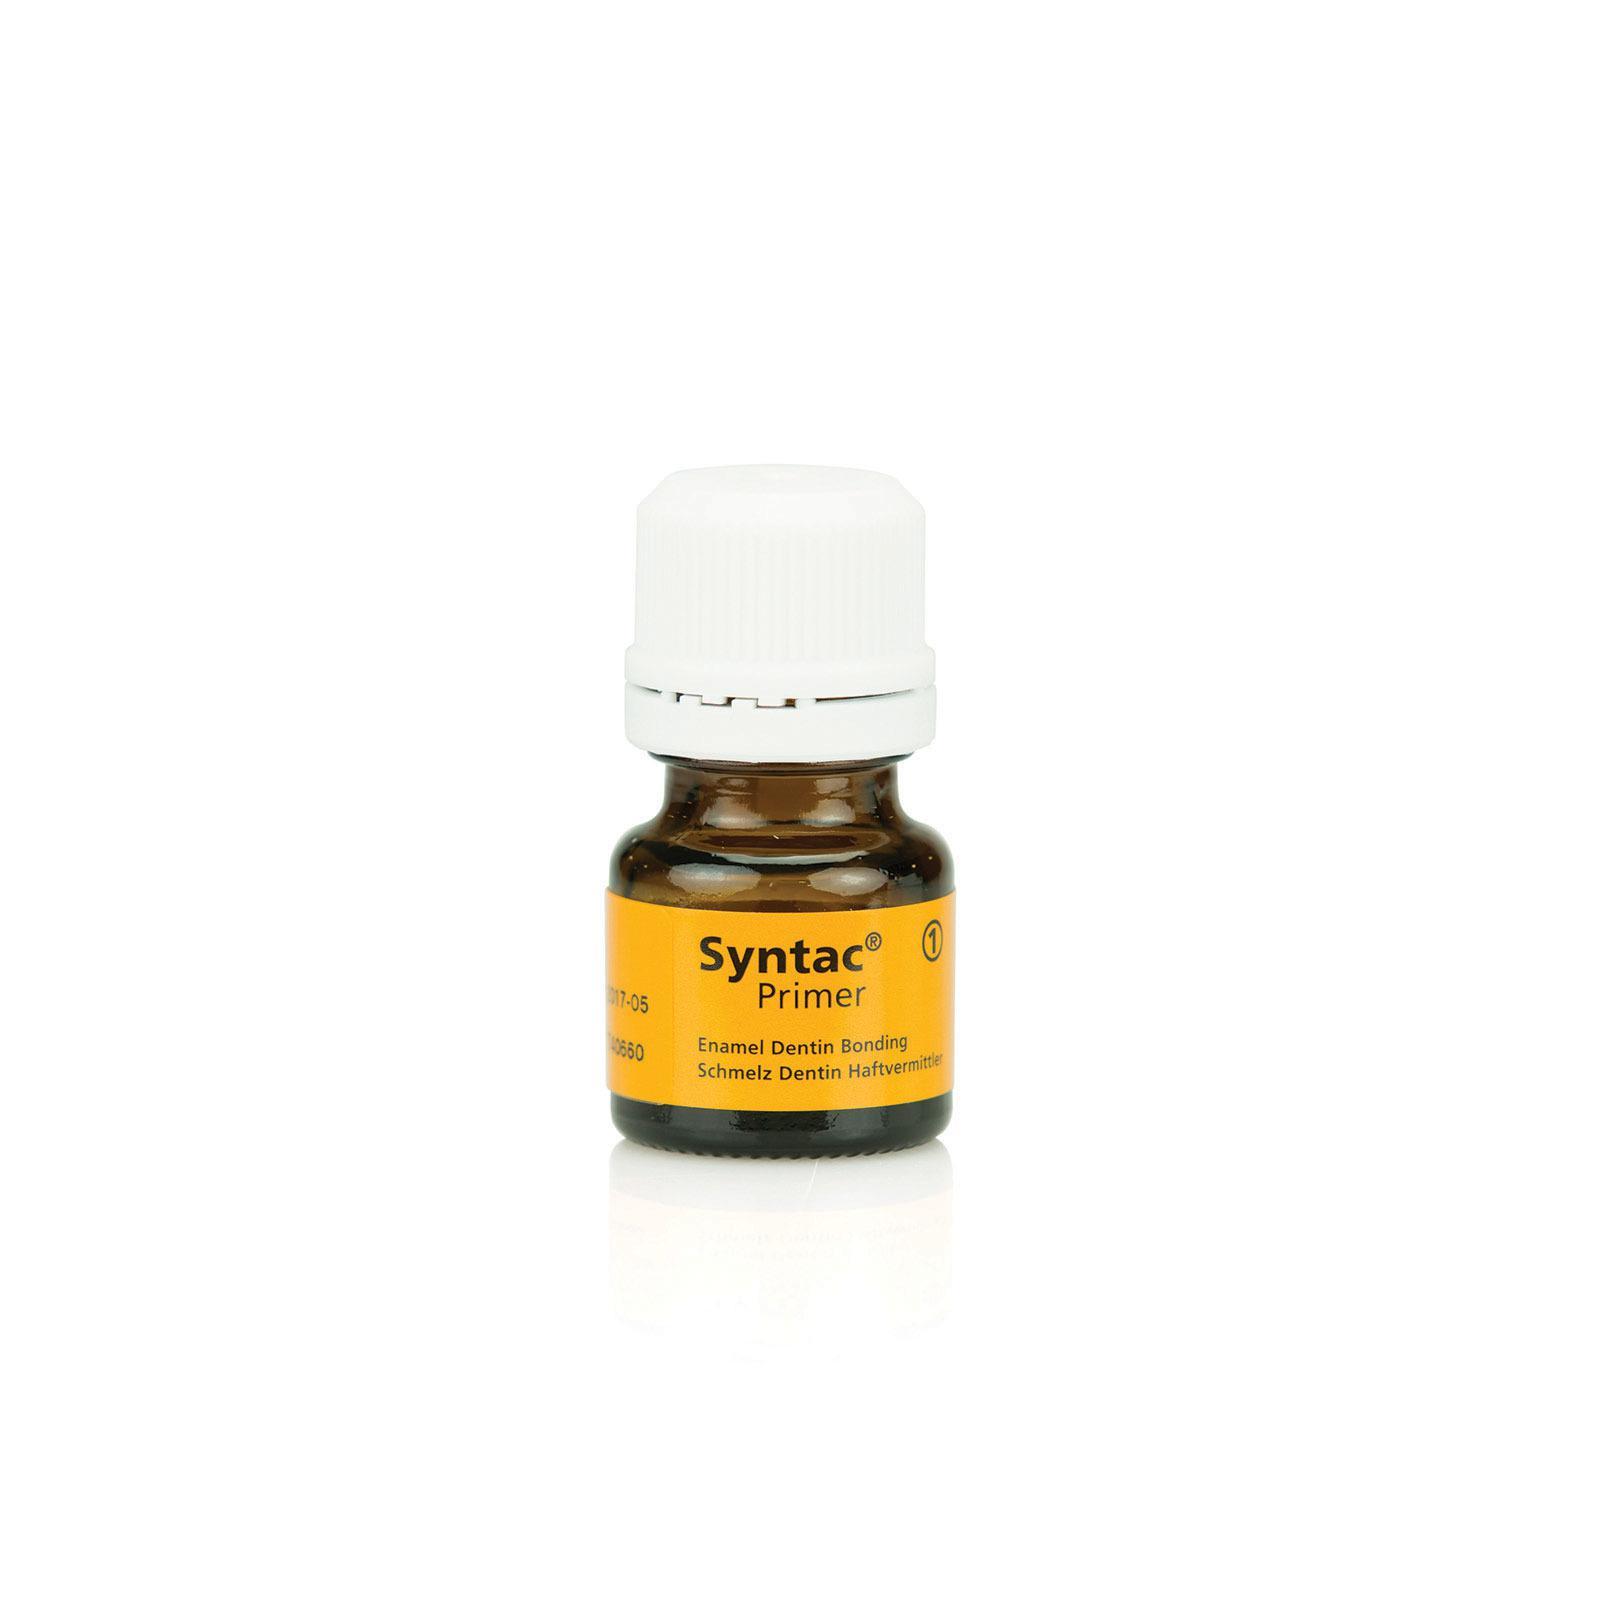 Syntac Primer Refill 3 g